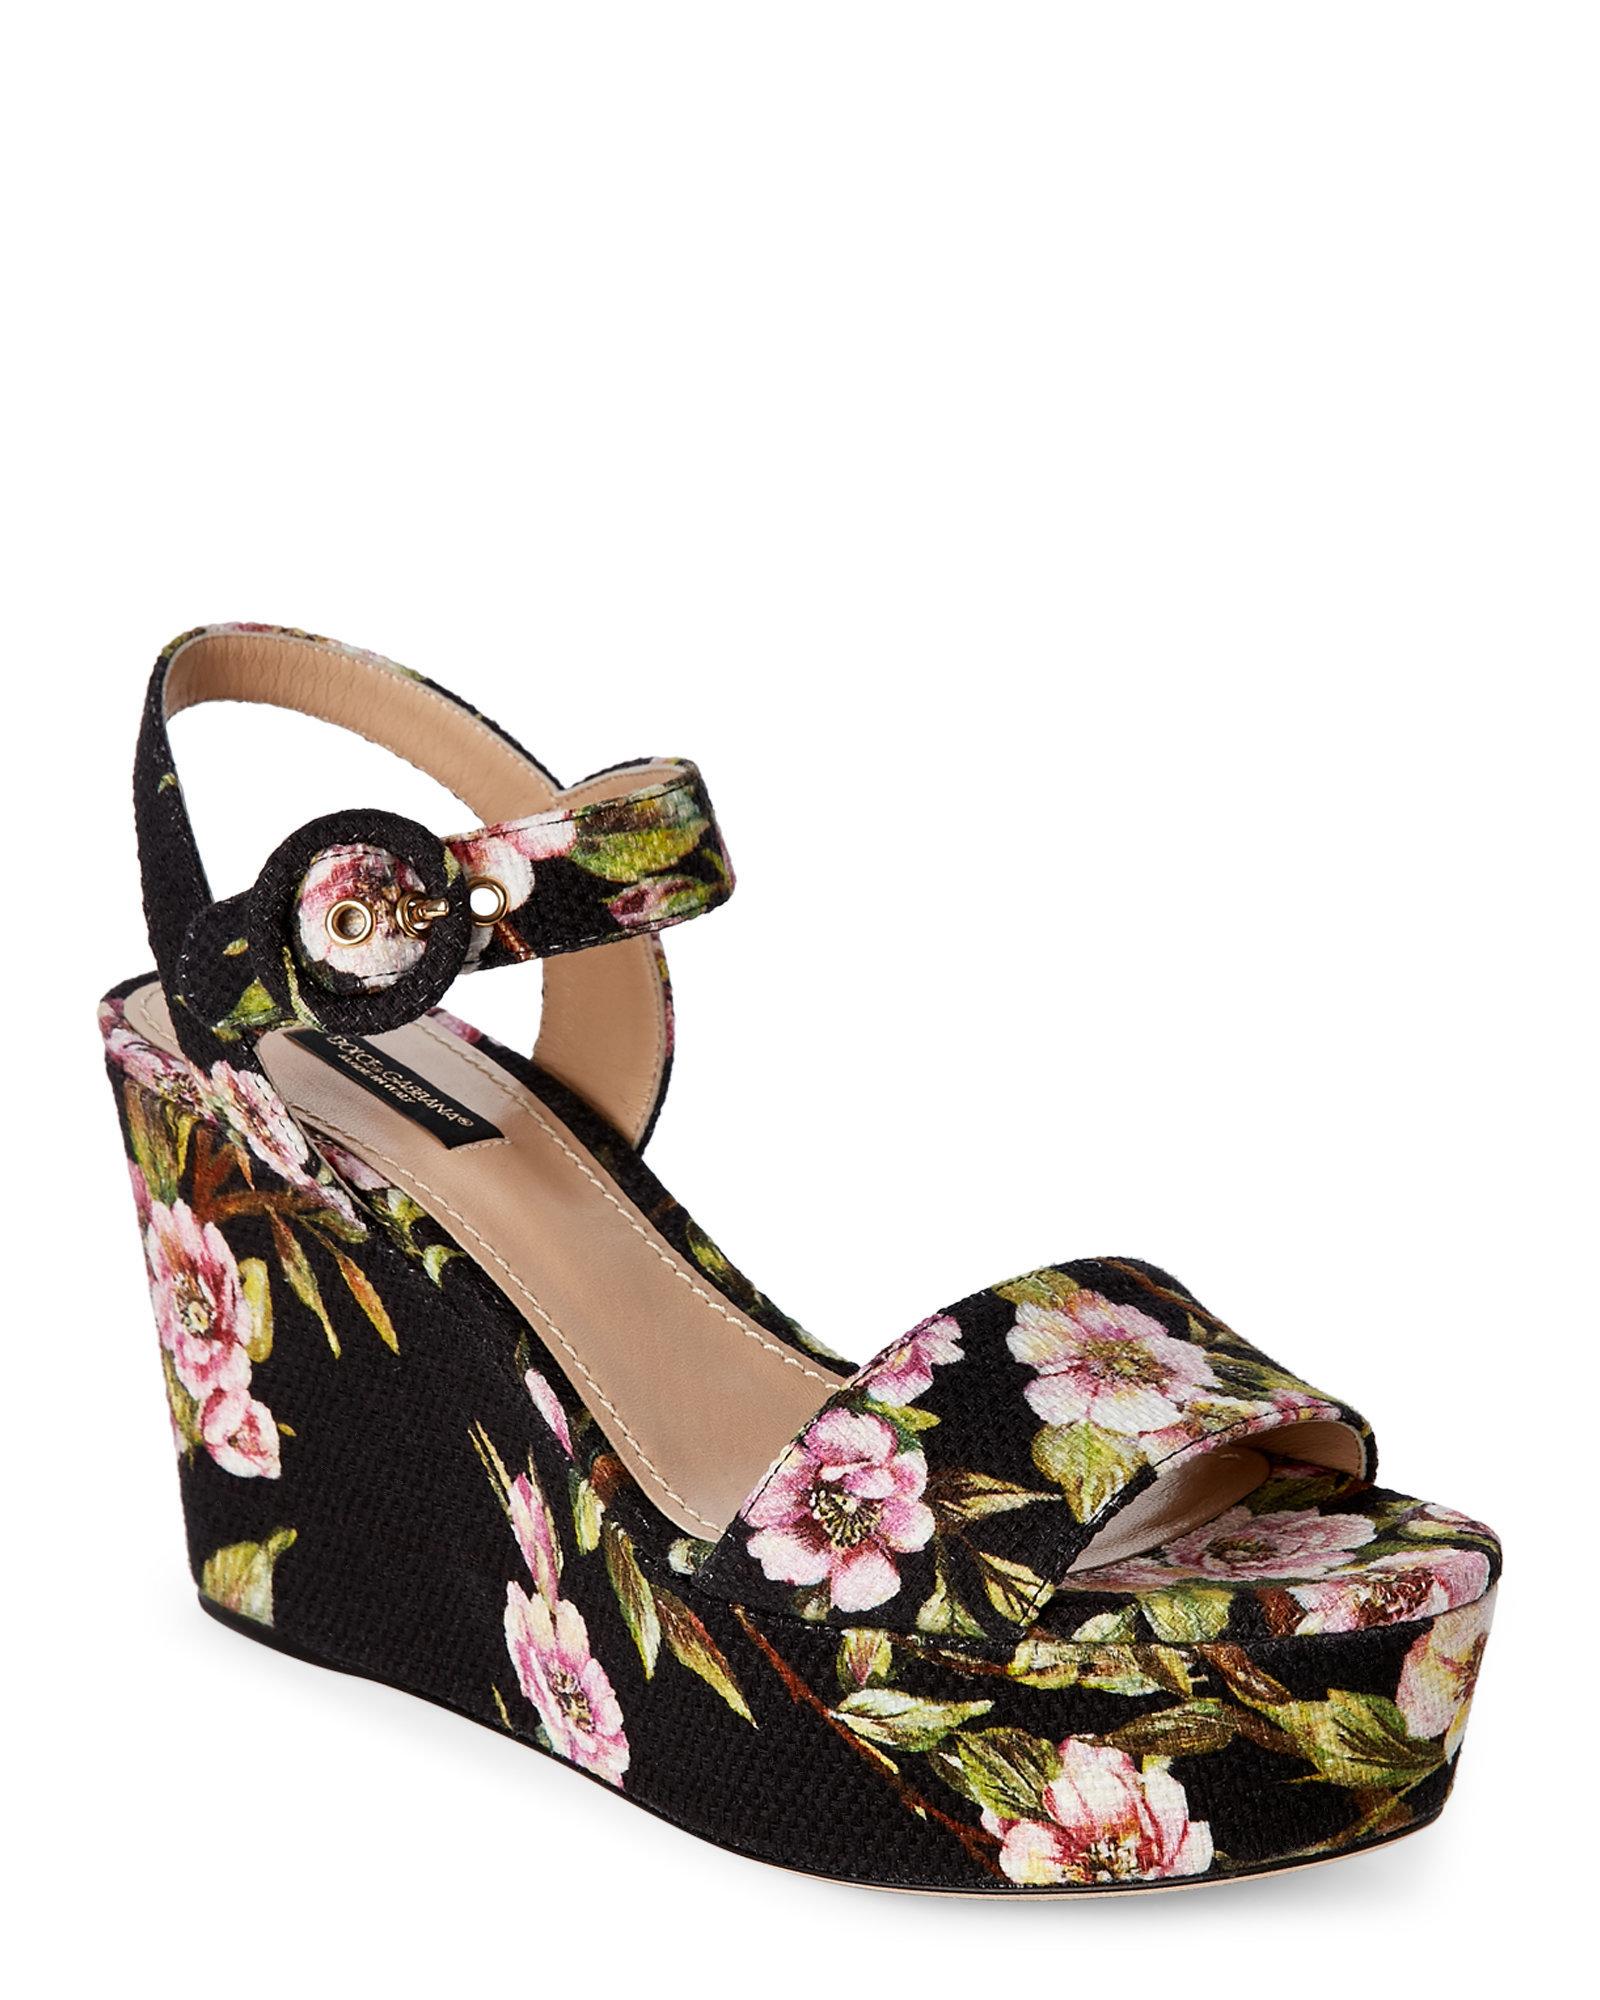 Black Floral Sandals   Best Dresses 2019